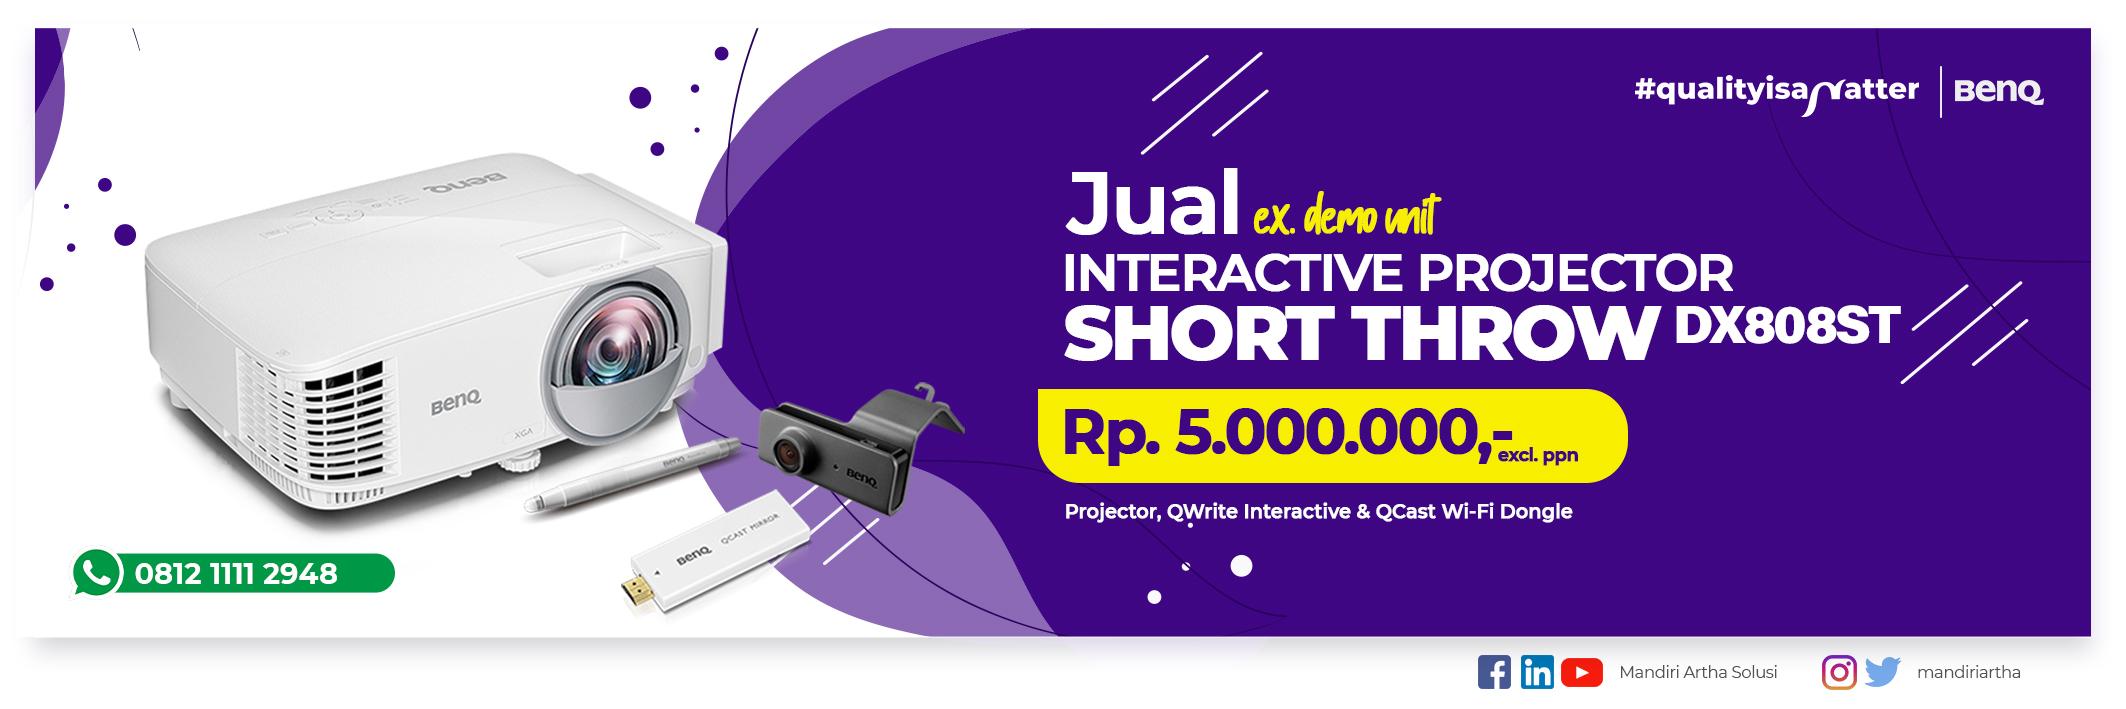 Jual Projector Short Throw DX808ST - Desember 2020